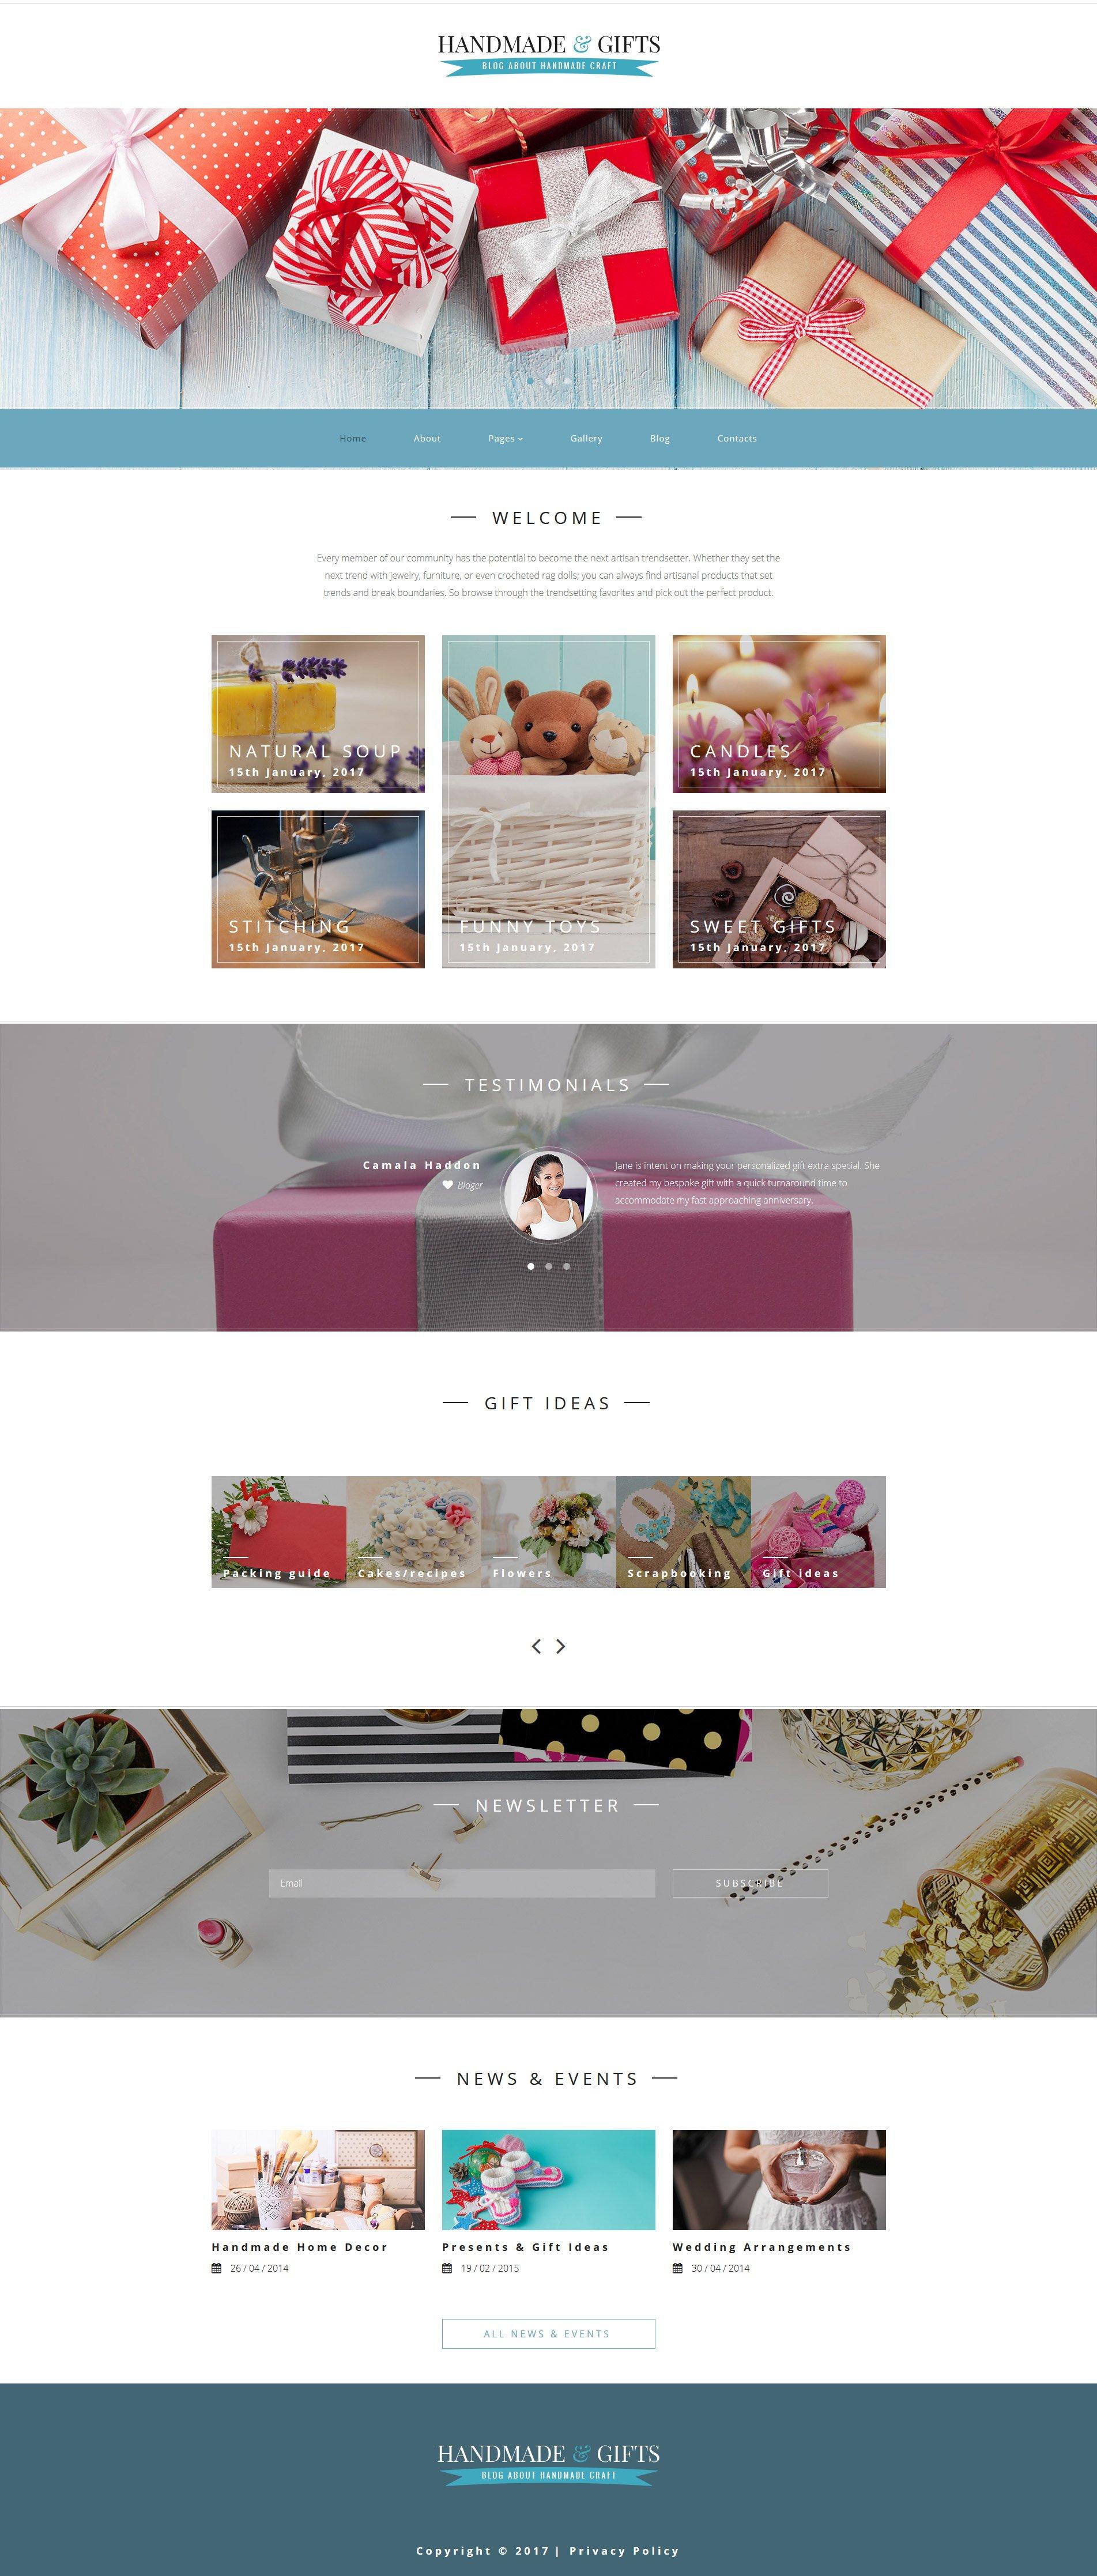 Responsivt Handmade & Gifts - Crafts Blog and Gift Store Joomla-mall #62277 - skärmbild